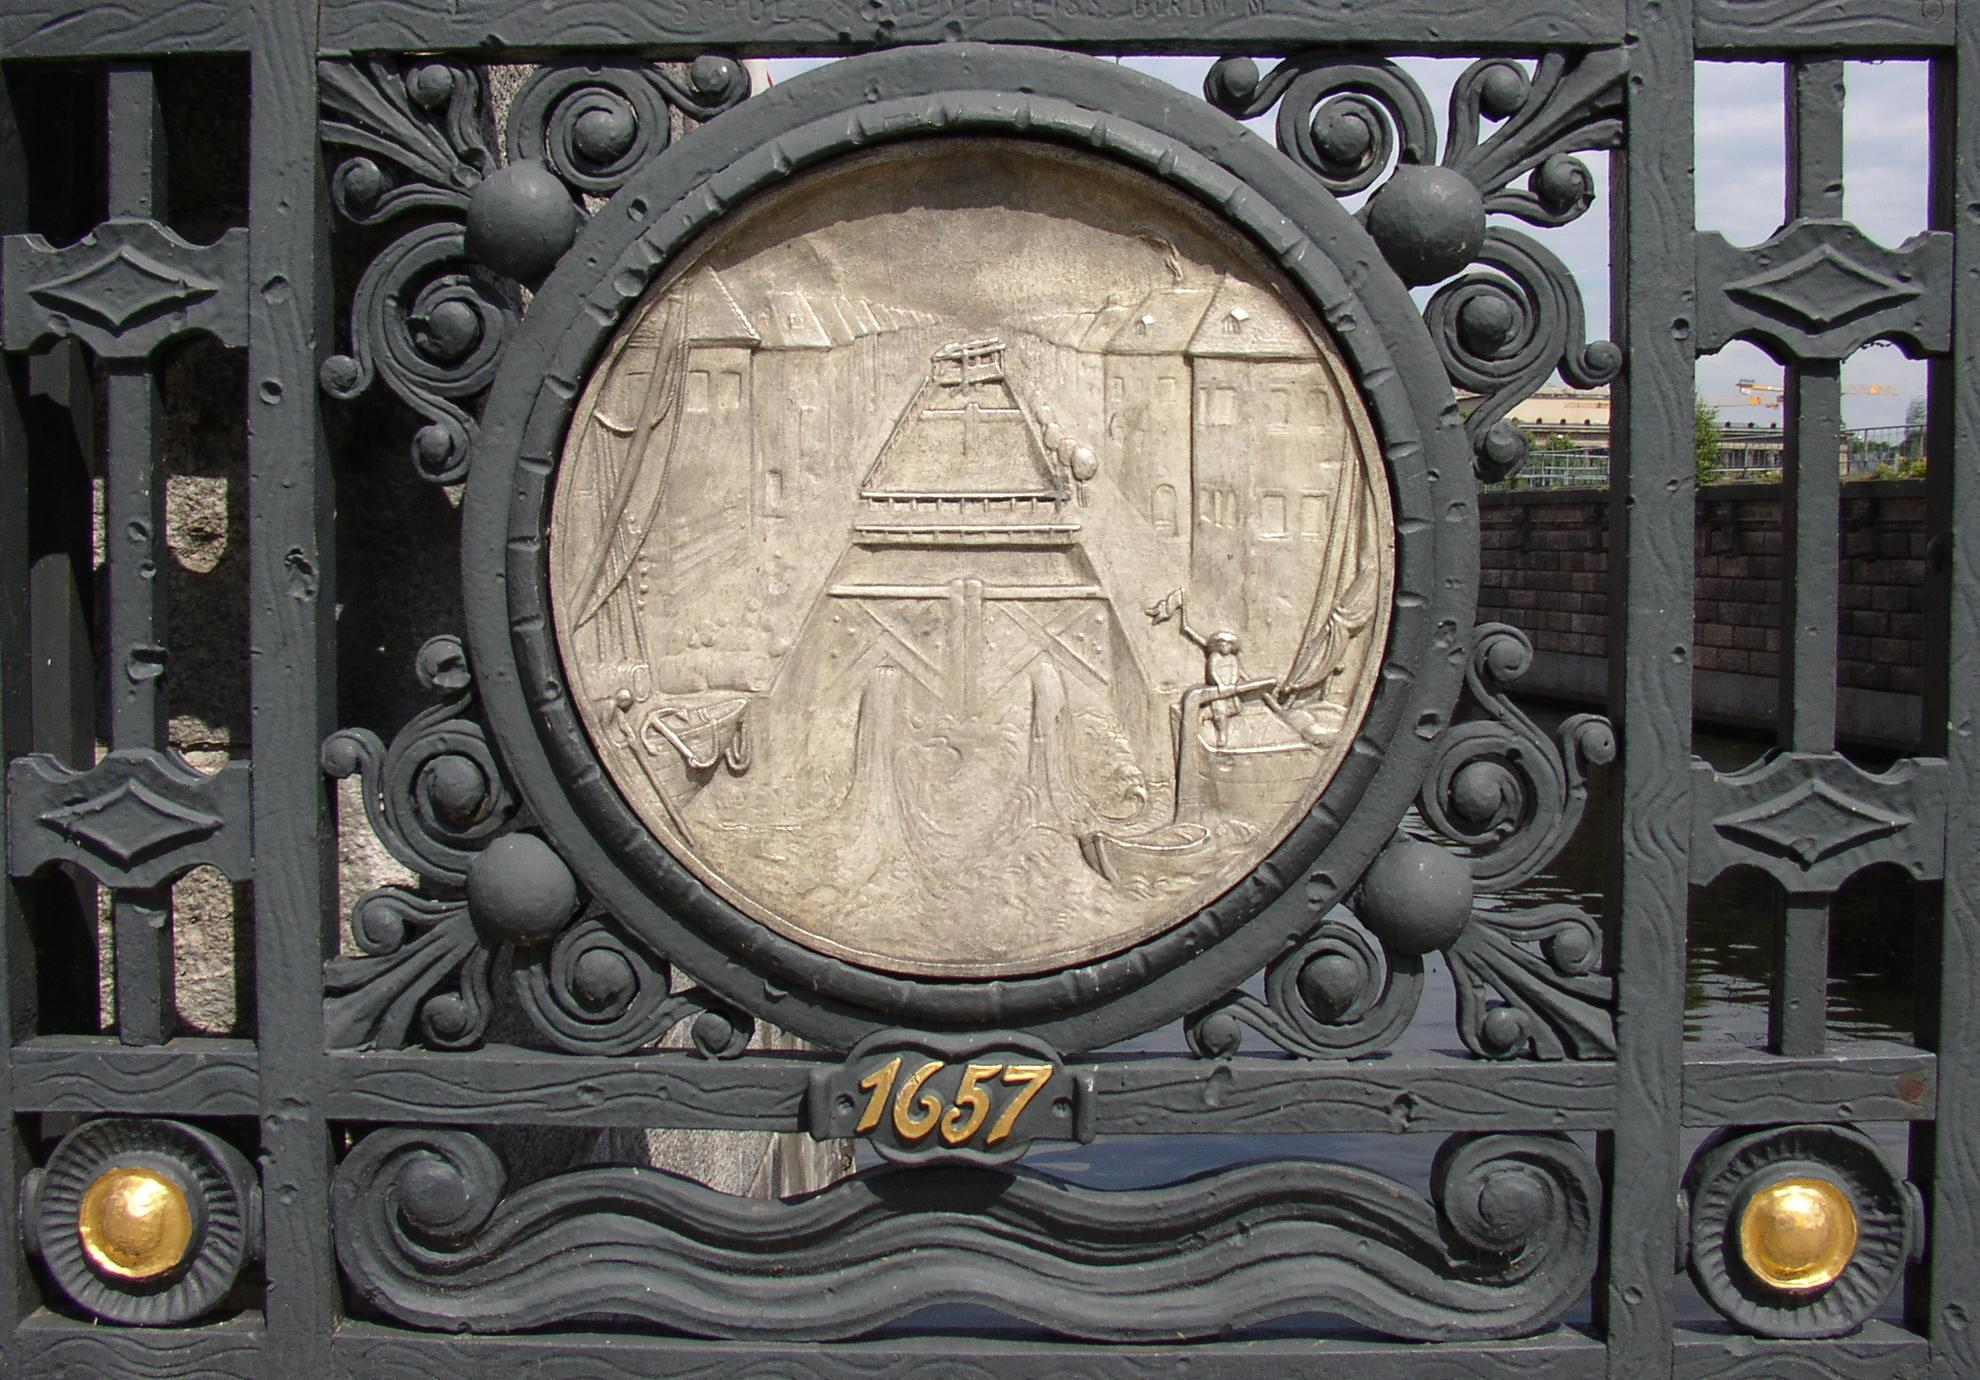 File:Berlin Schleusenbruecke 1657.jpg